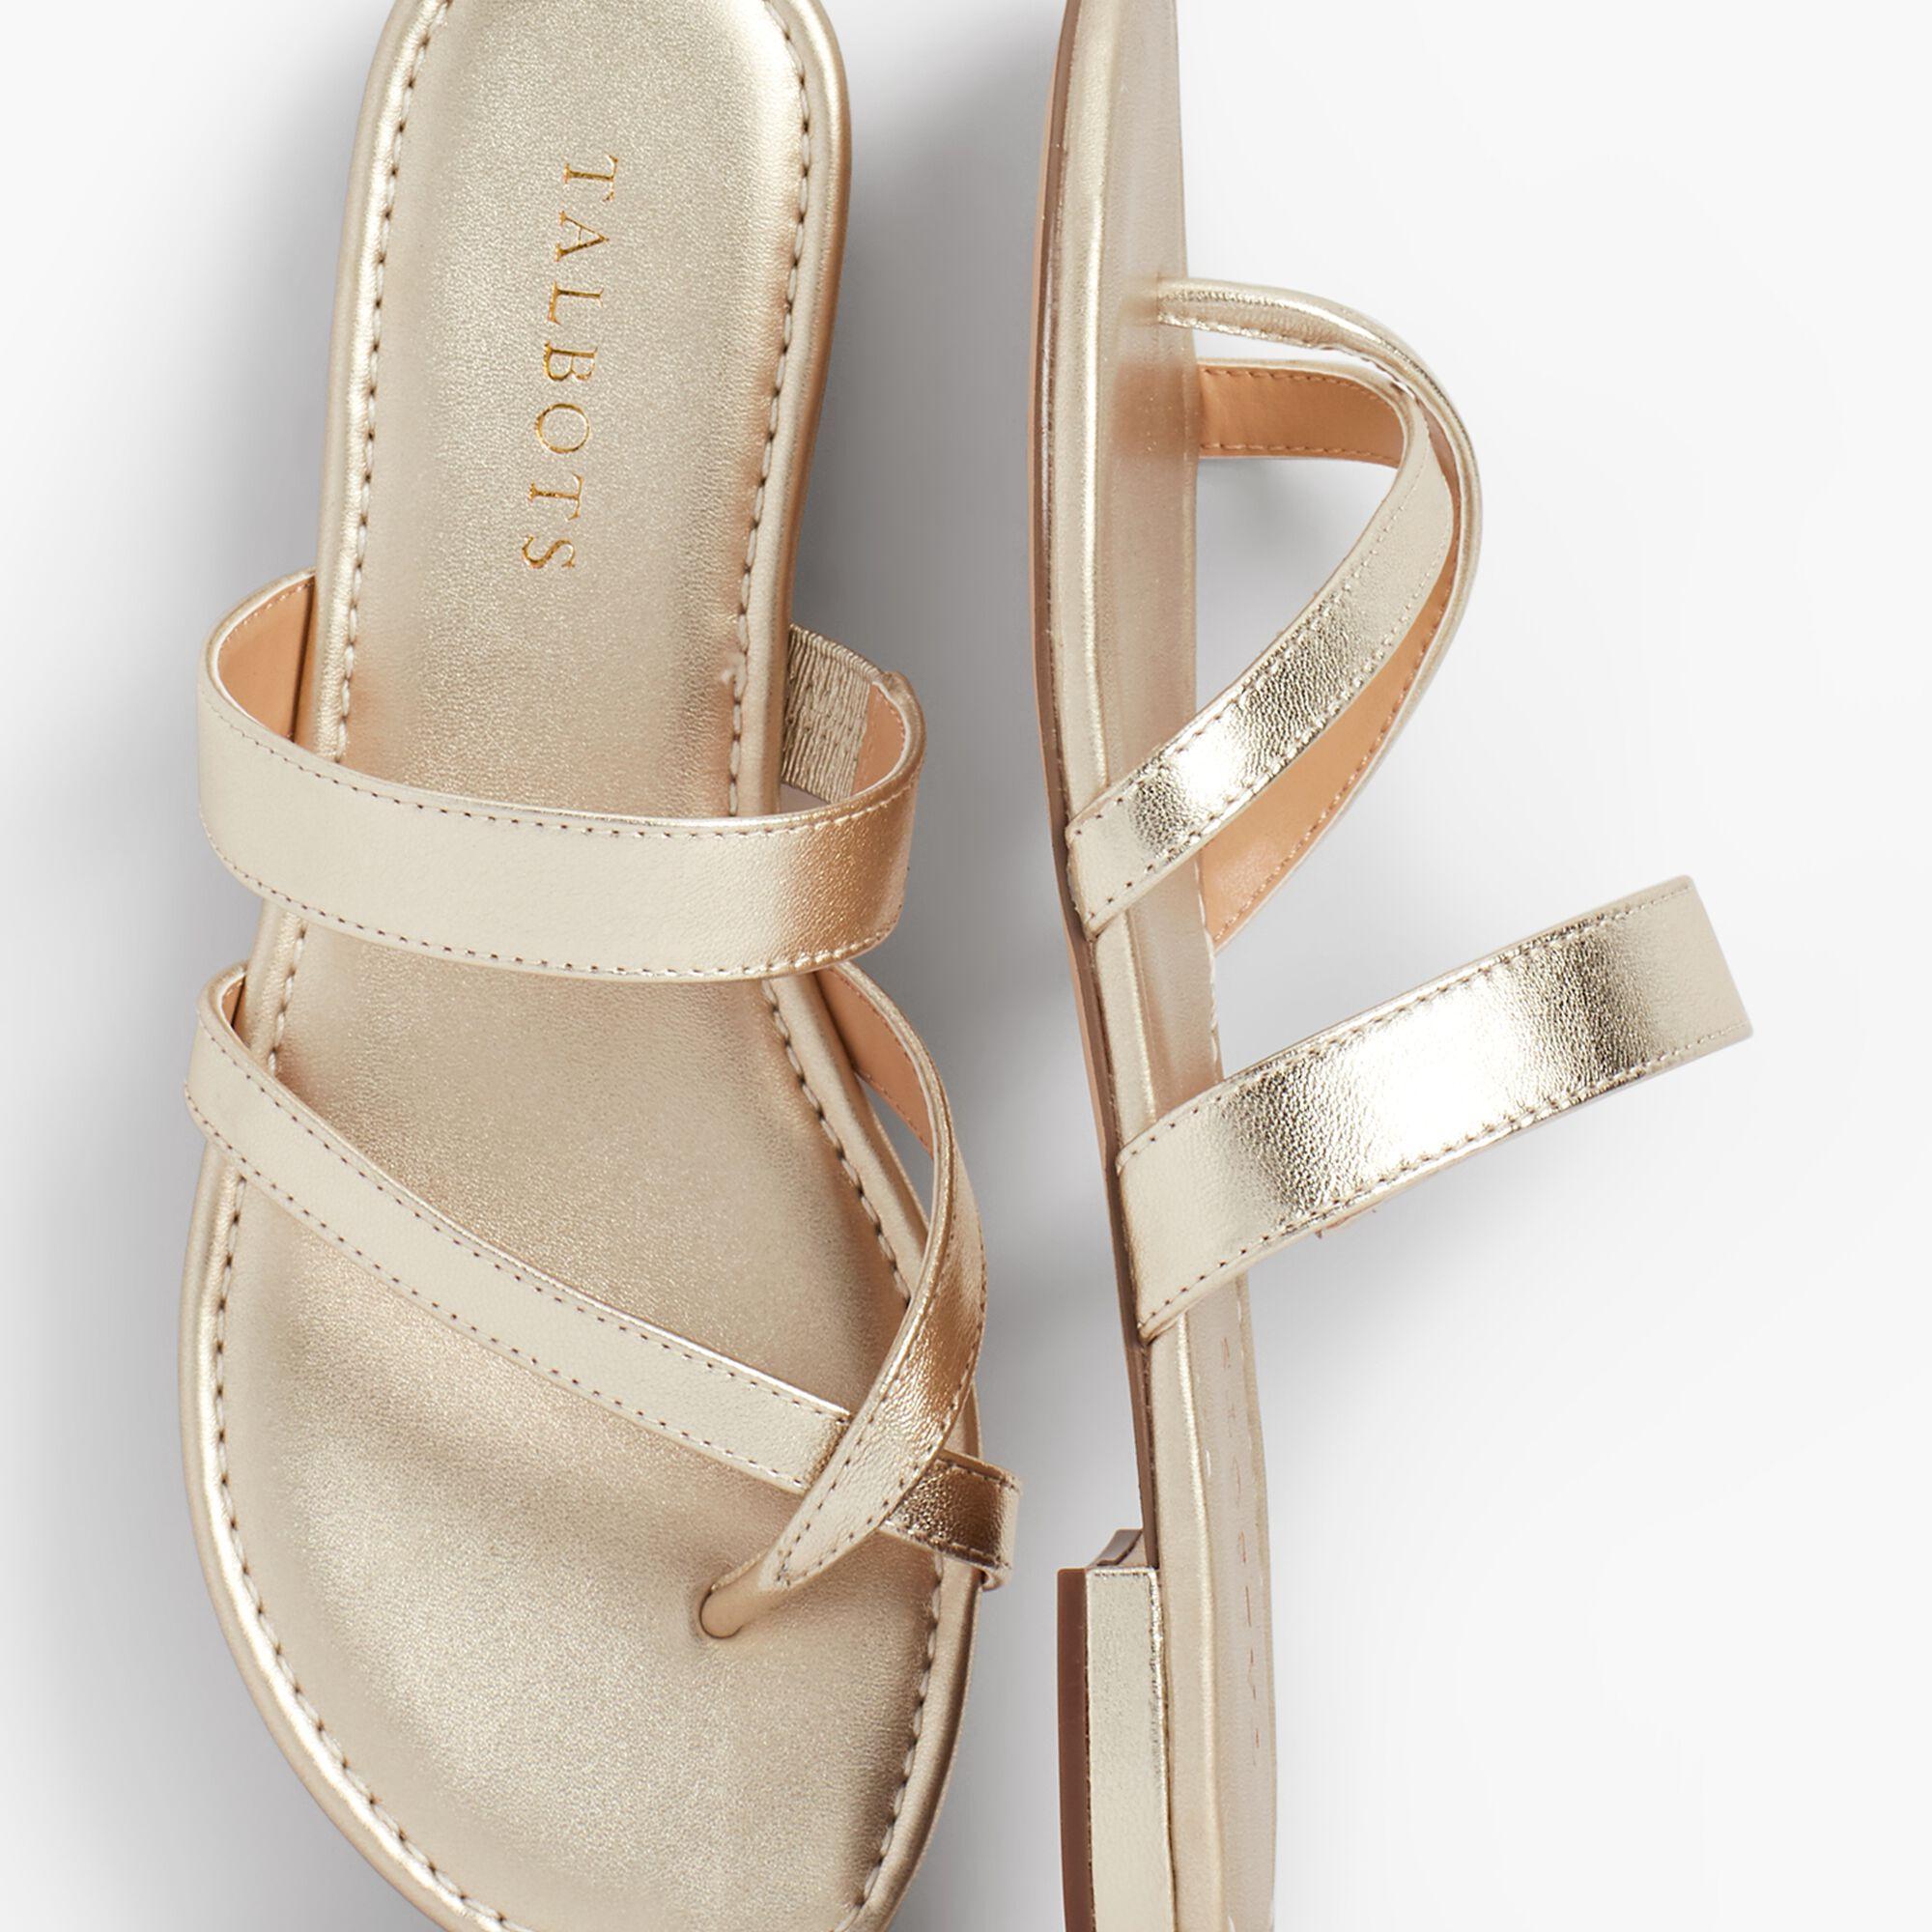 520eeec86 Gia Toe-Ring Sandals - Metallic Nappa